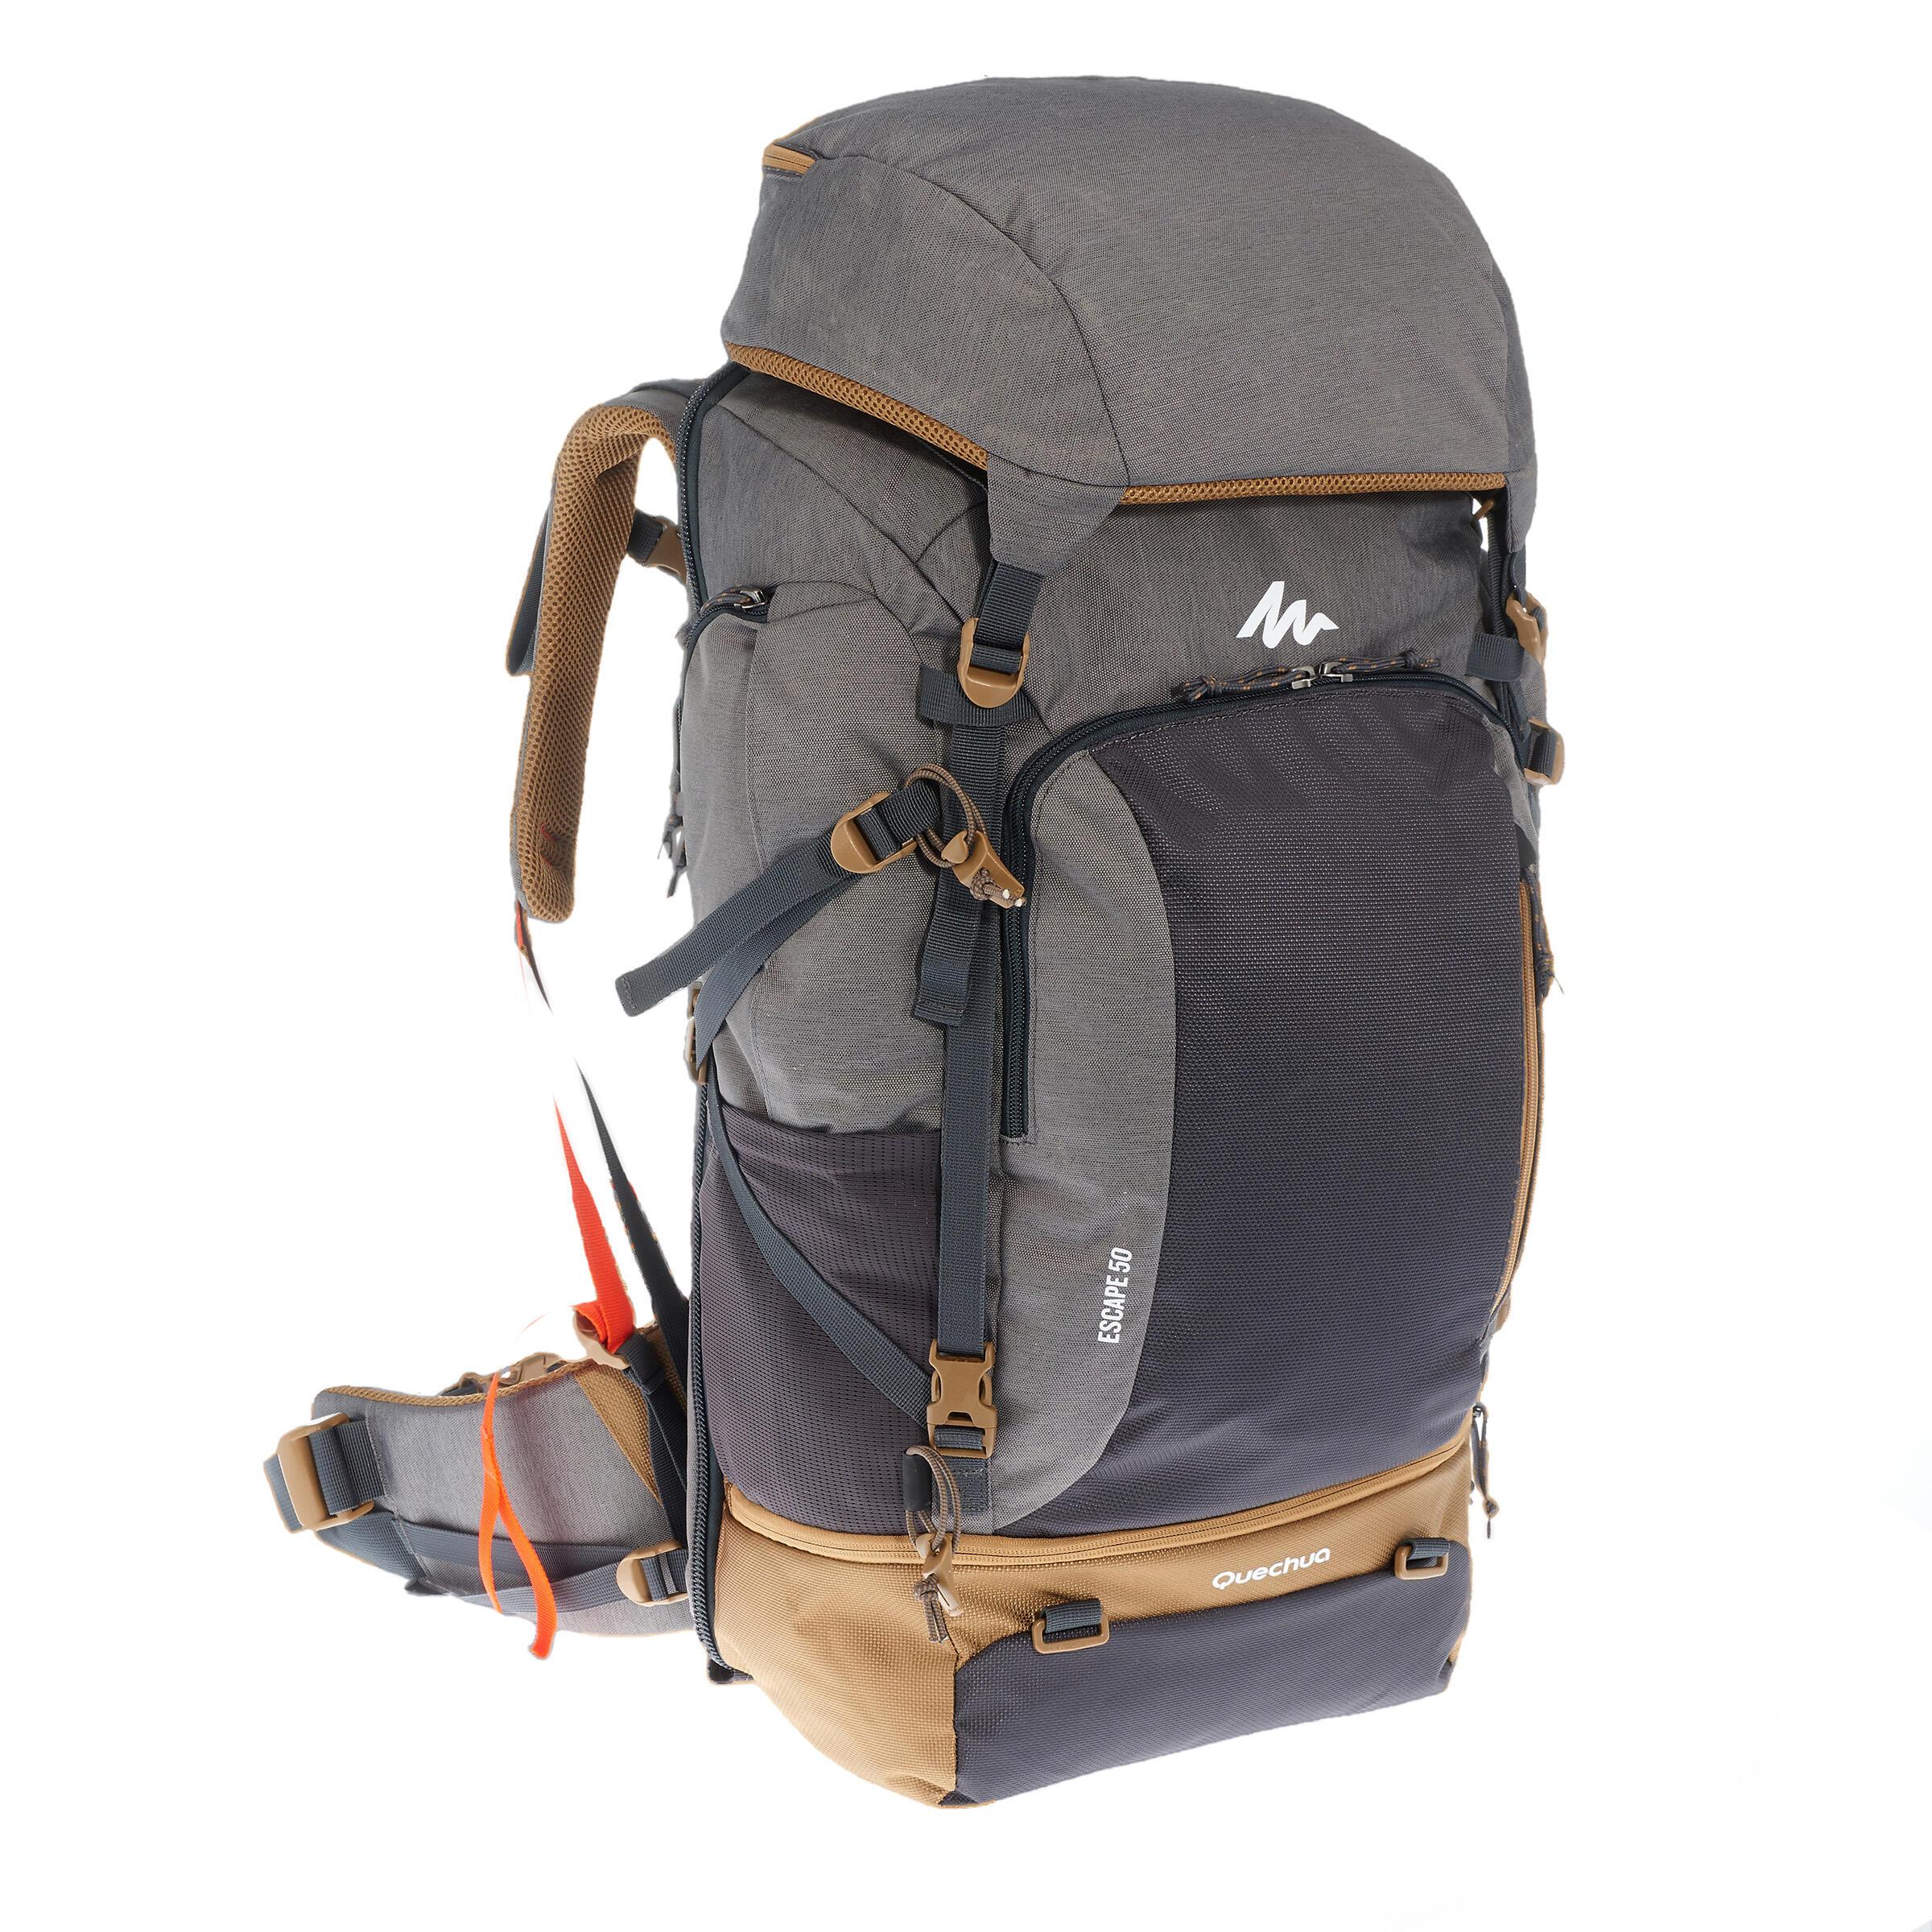 cec9657555f4 Backpack